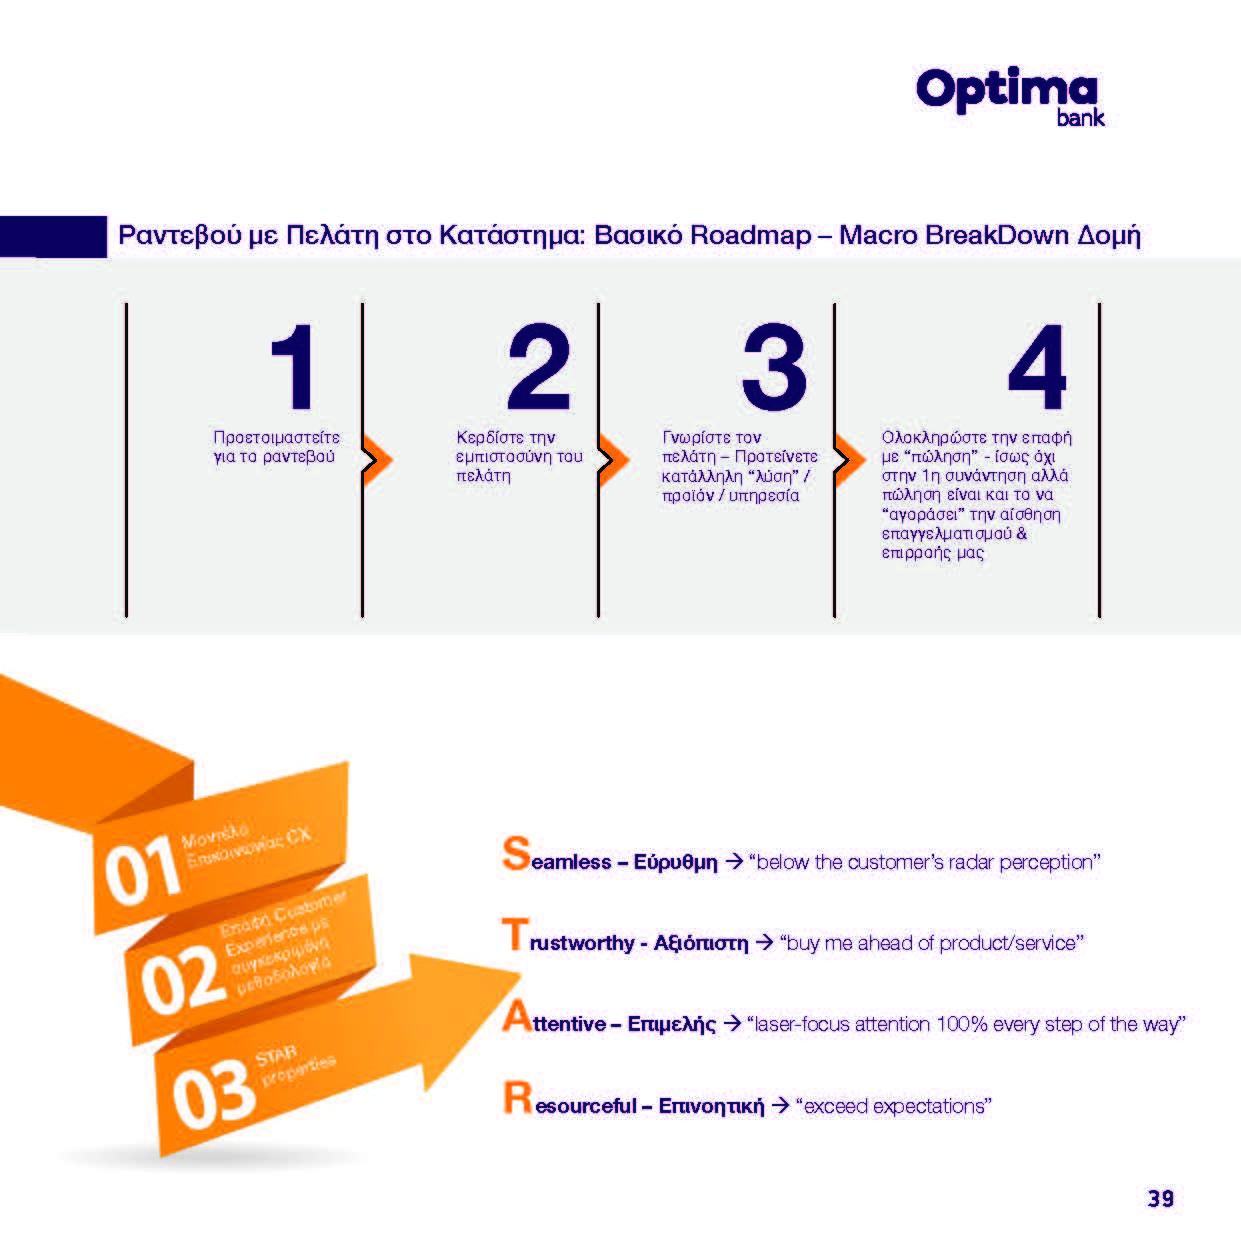 https://www.jib.gr/wp-content/uploads/2020/09/OPTIMA-BANK-BOOKLET-WEB_Page_039.jpg